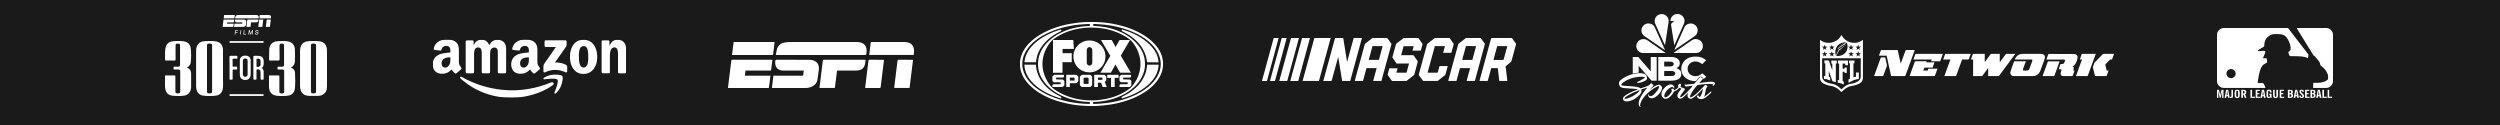 DLP_About_Logos(LongForm).jpg